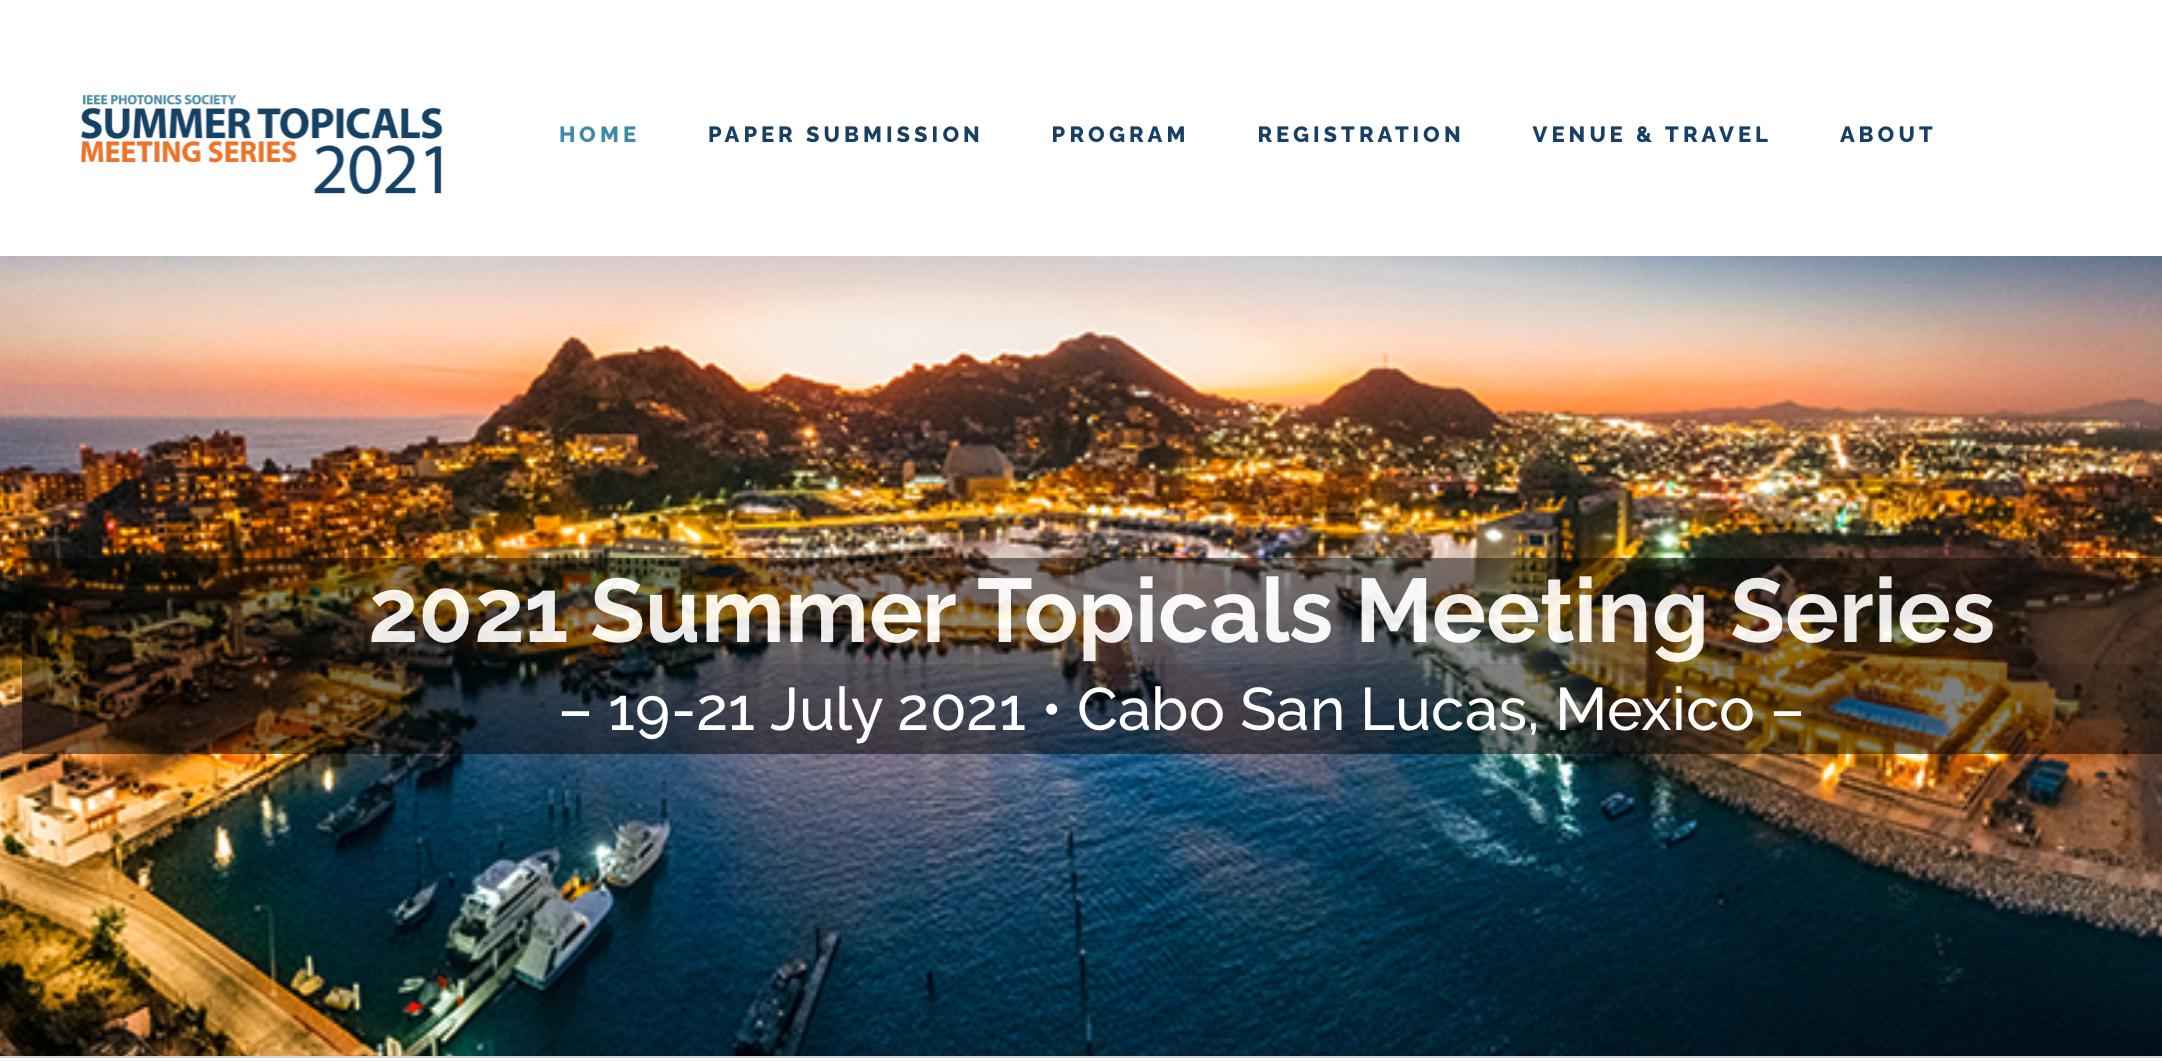 IEEE Summer Topicals Meeting Series 2021